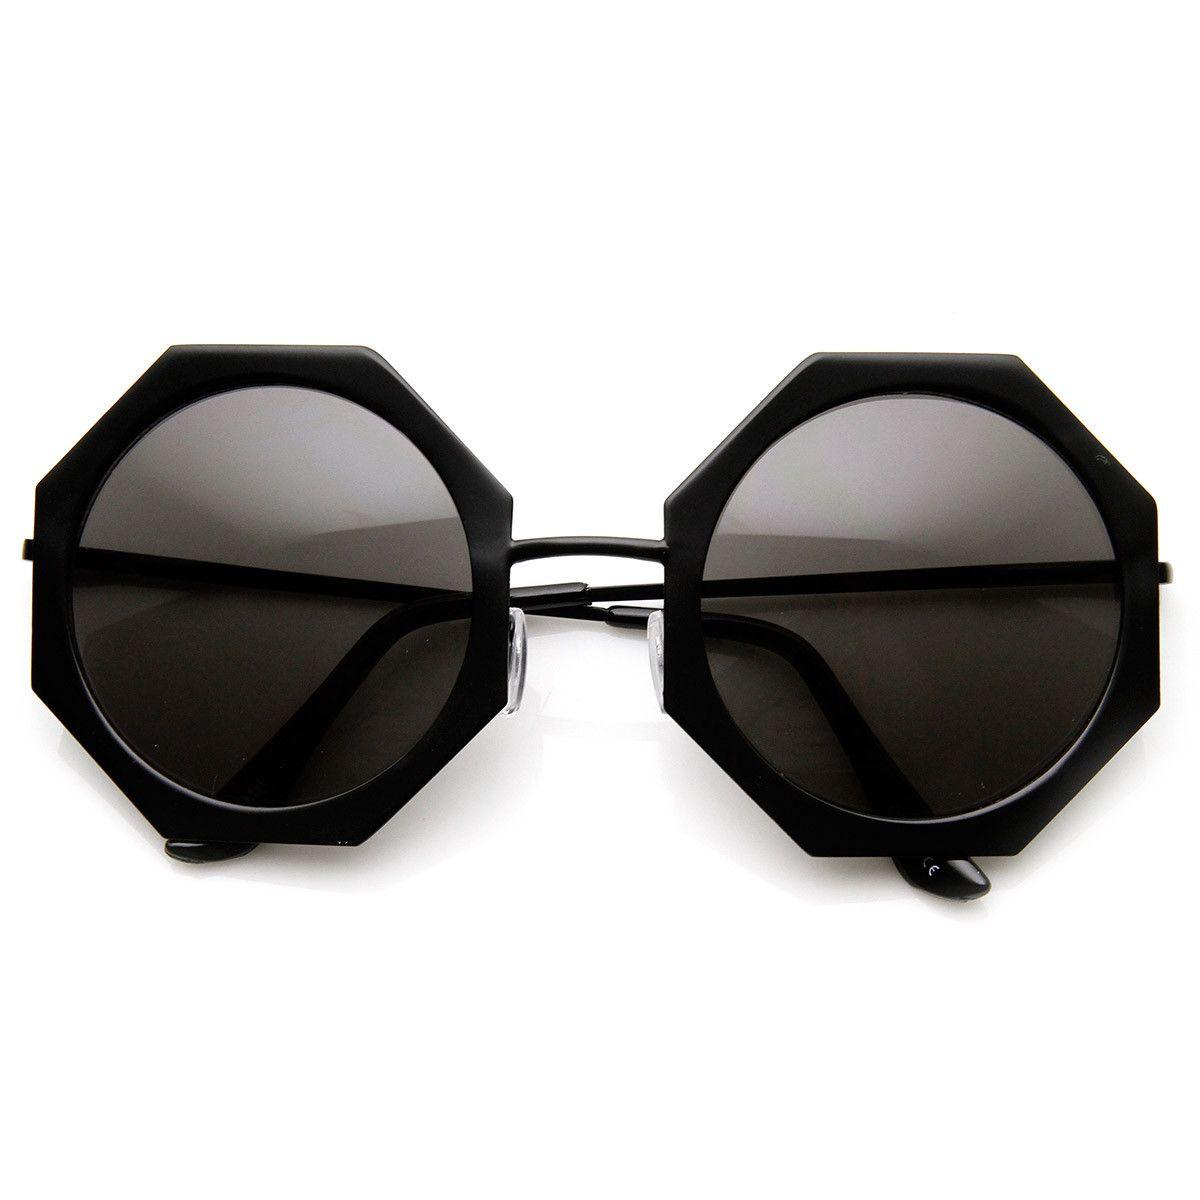 Oversize Aviator Round Design Men Women Fashion Style Brow Bar Metal Sunglasses